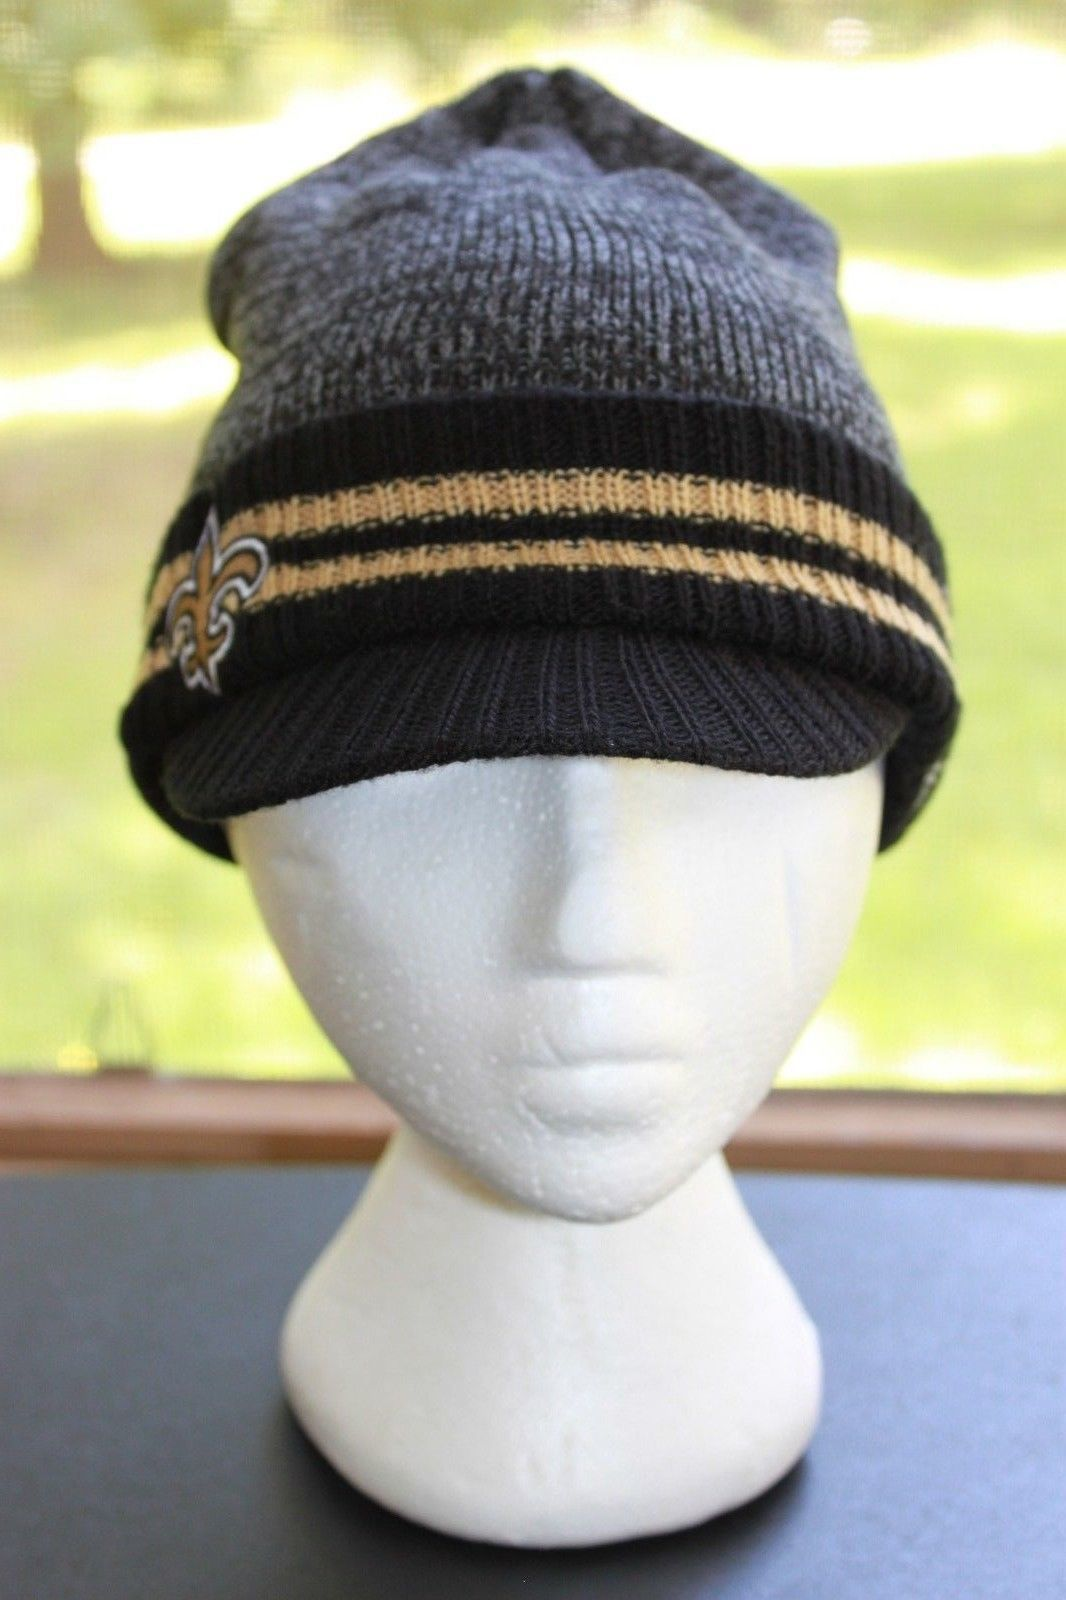 2b6019077 Reebok New Orleans Saints NFL On Field Knit and 50 similar items